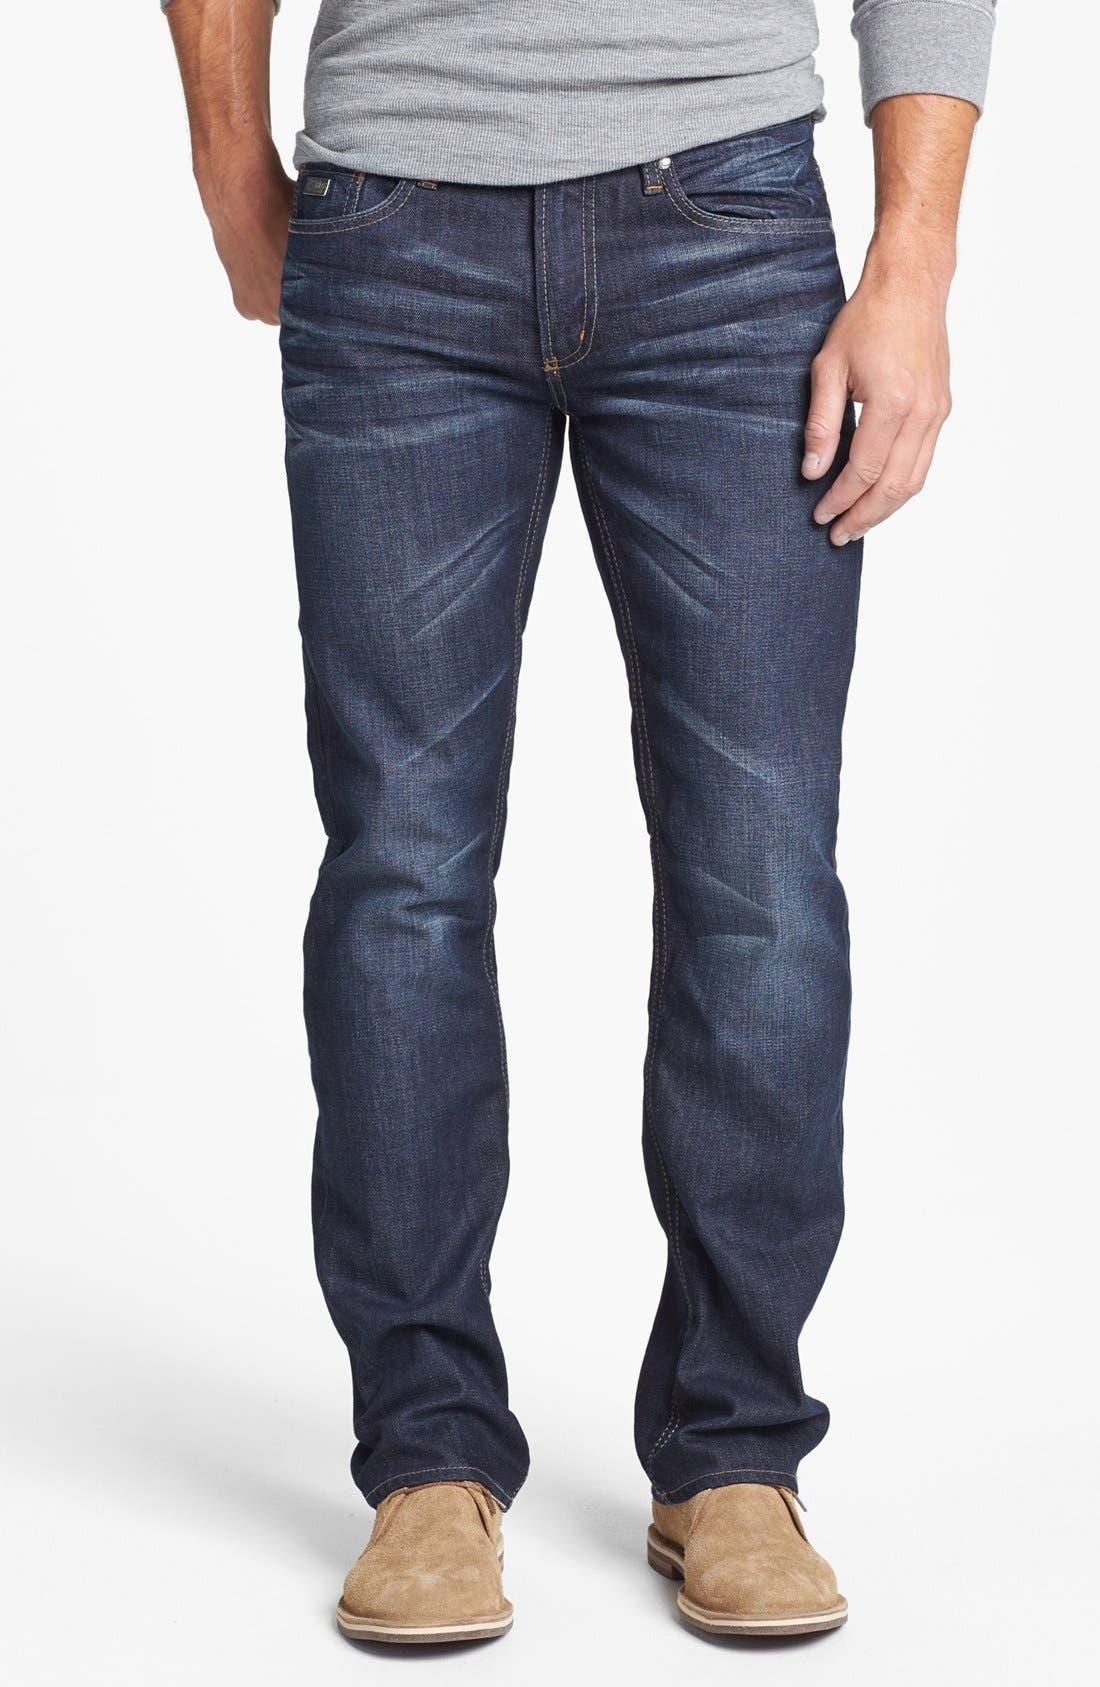 Alternate Image 1 Selected - Buffalo Jeans 'Six' Straight Leg Jeans (Slightly Washed)